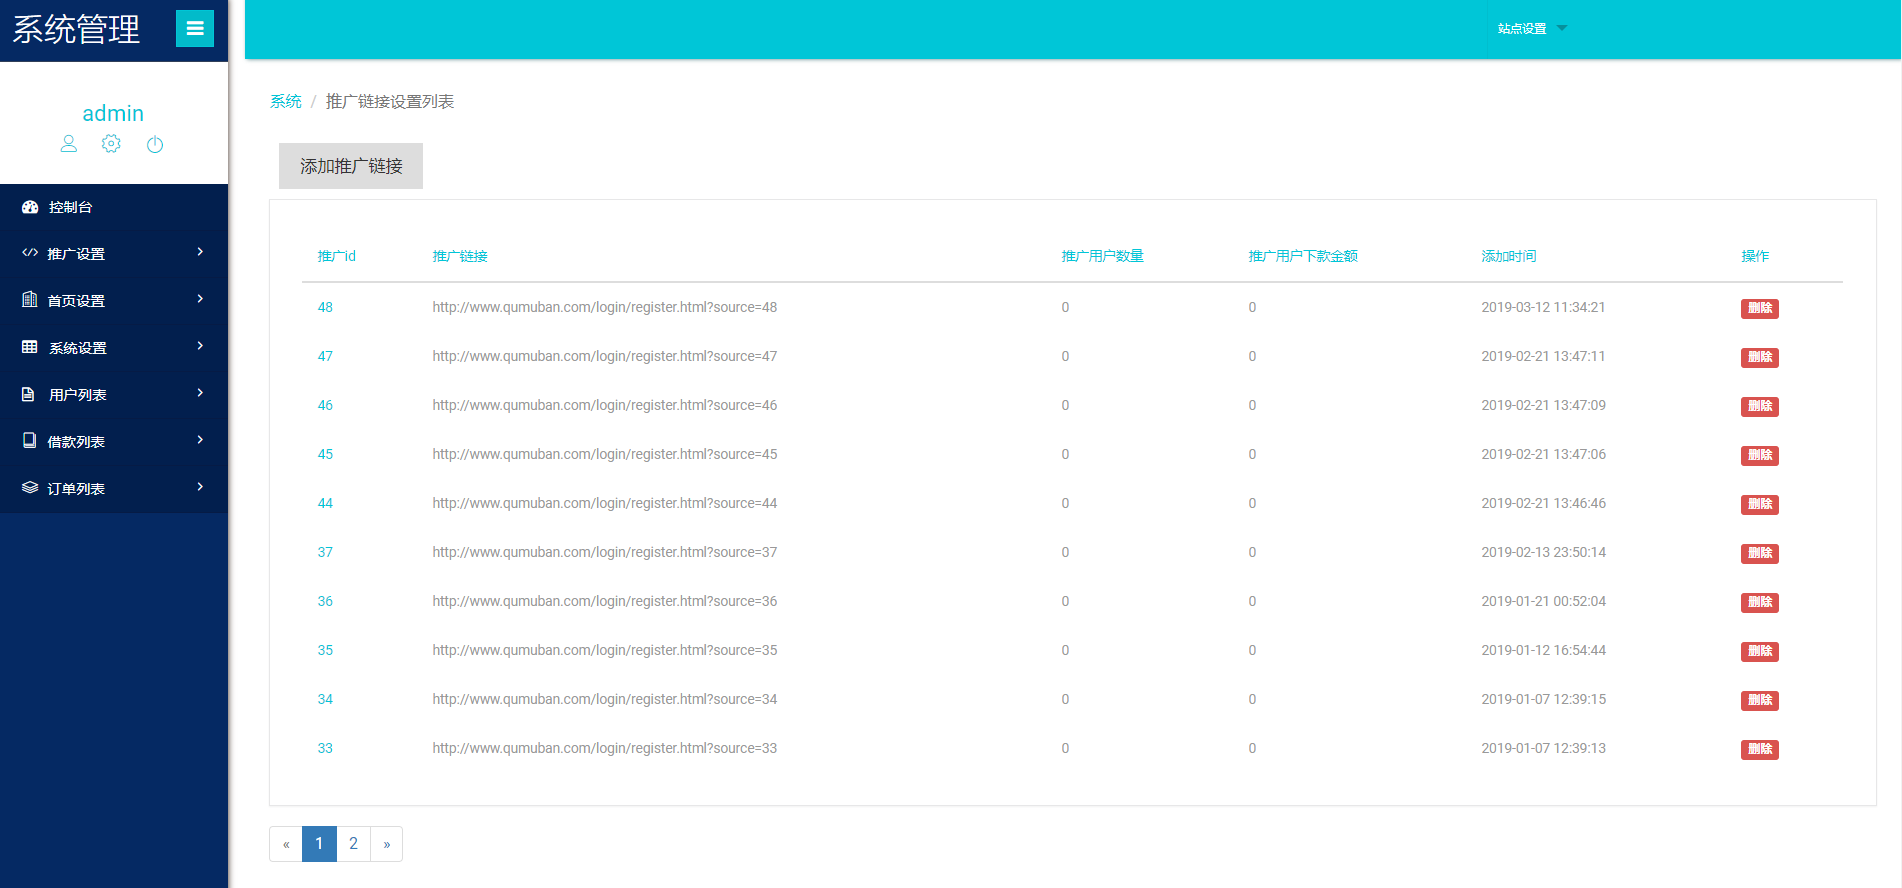 ThinkPHP框架 非常漂亮UI红色网贷借款源码 接入第三方认证 简单安装说明